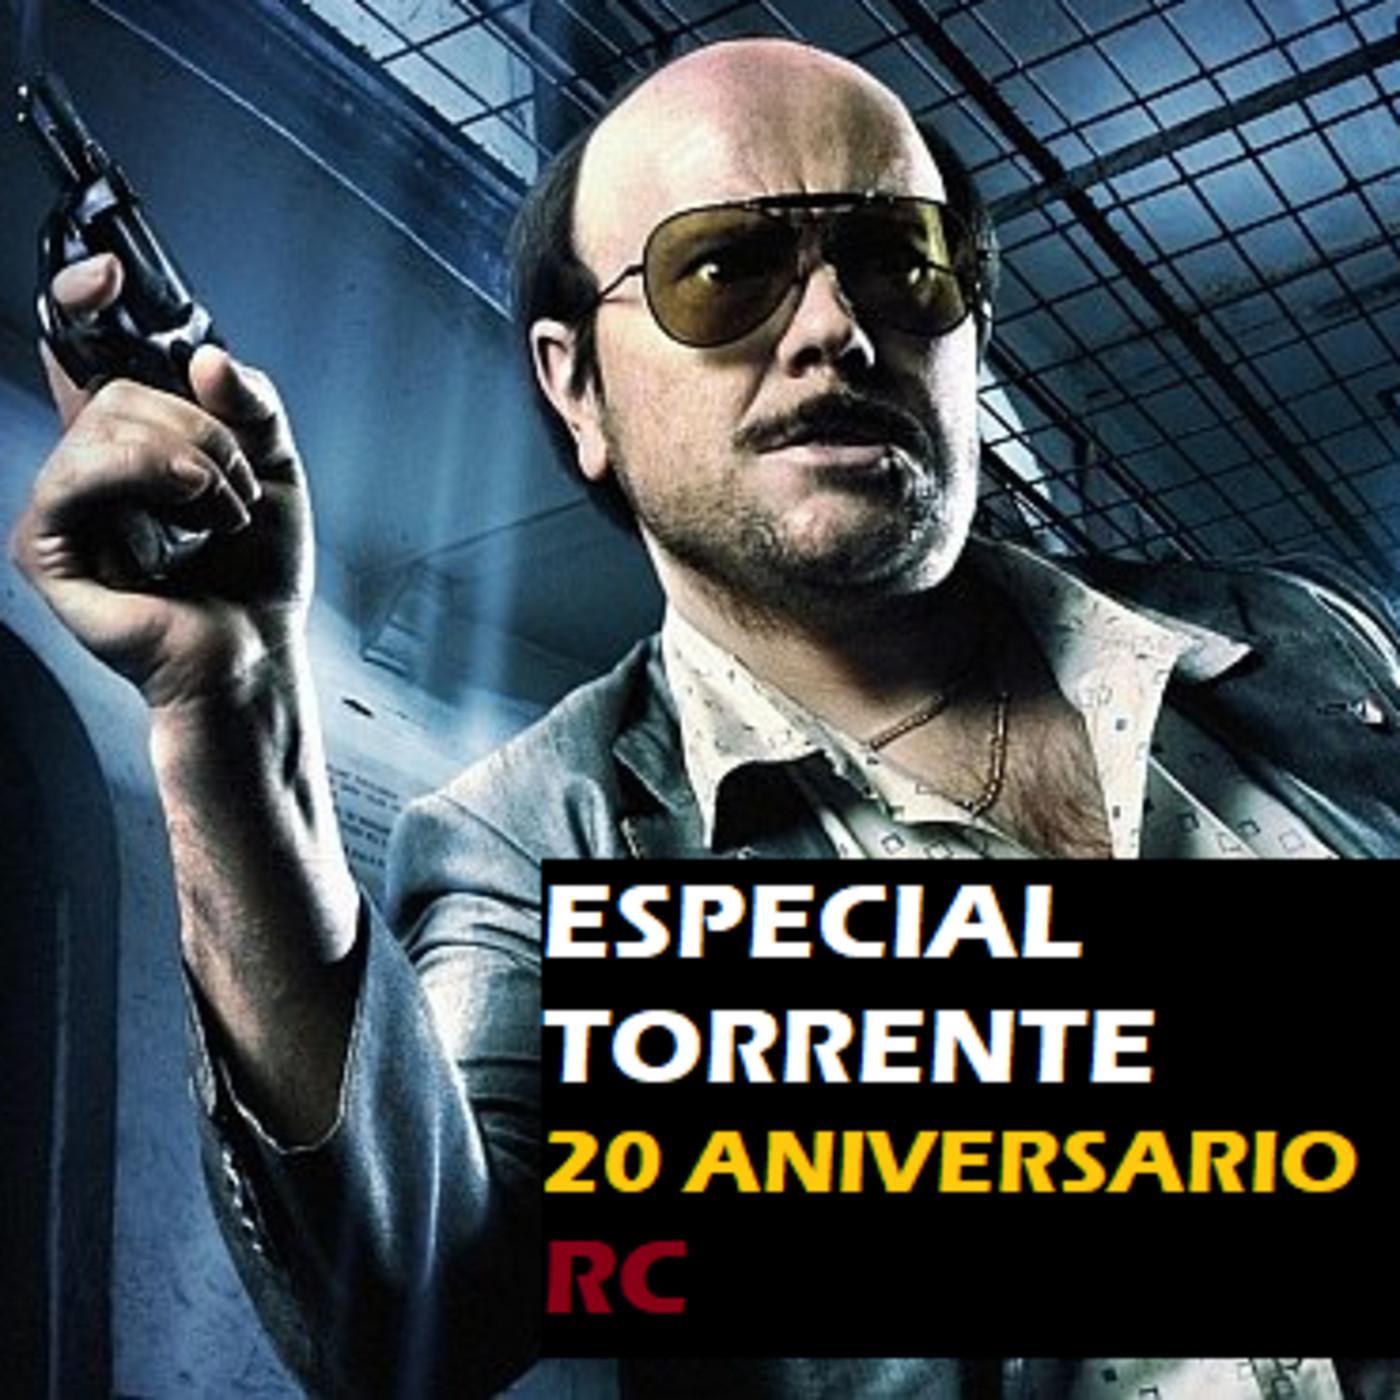 torrente 1 teljes film youtube